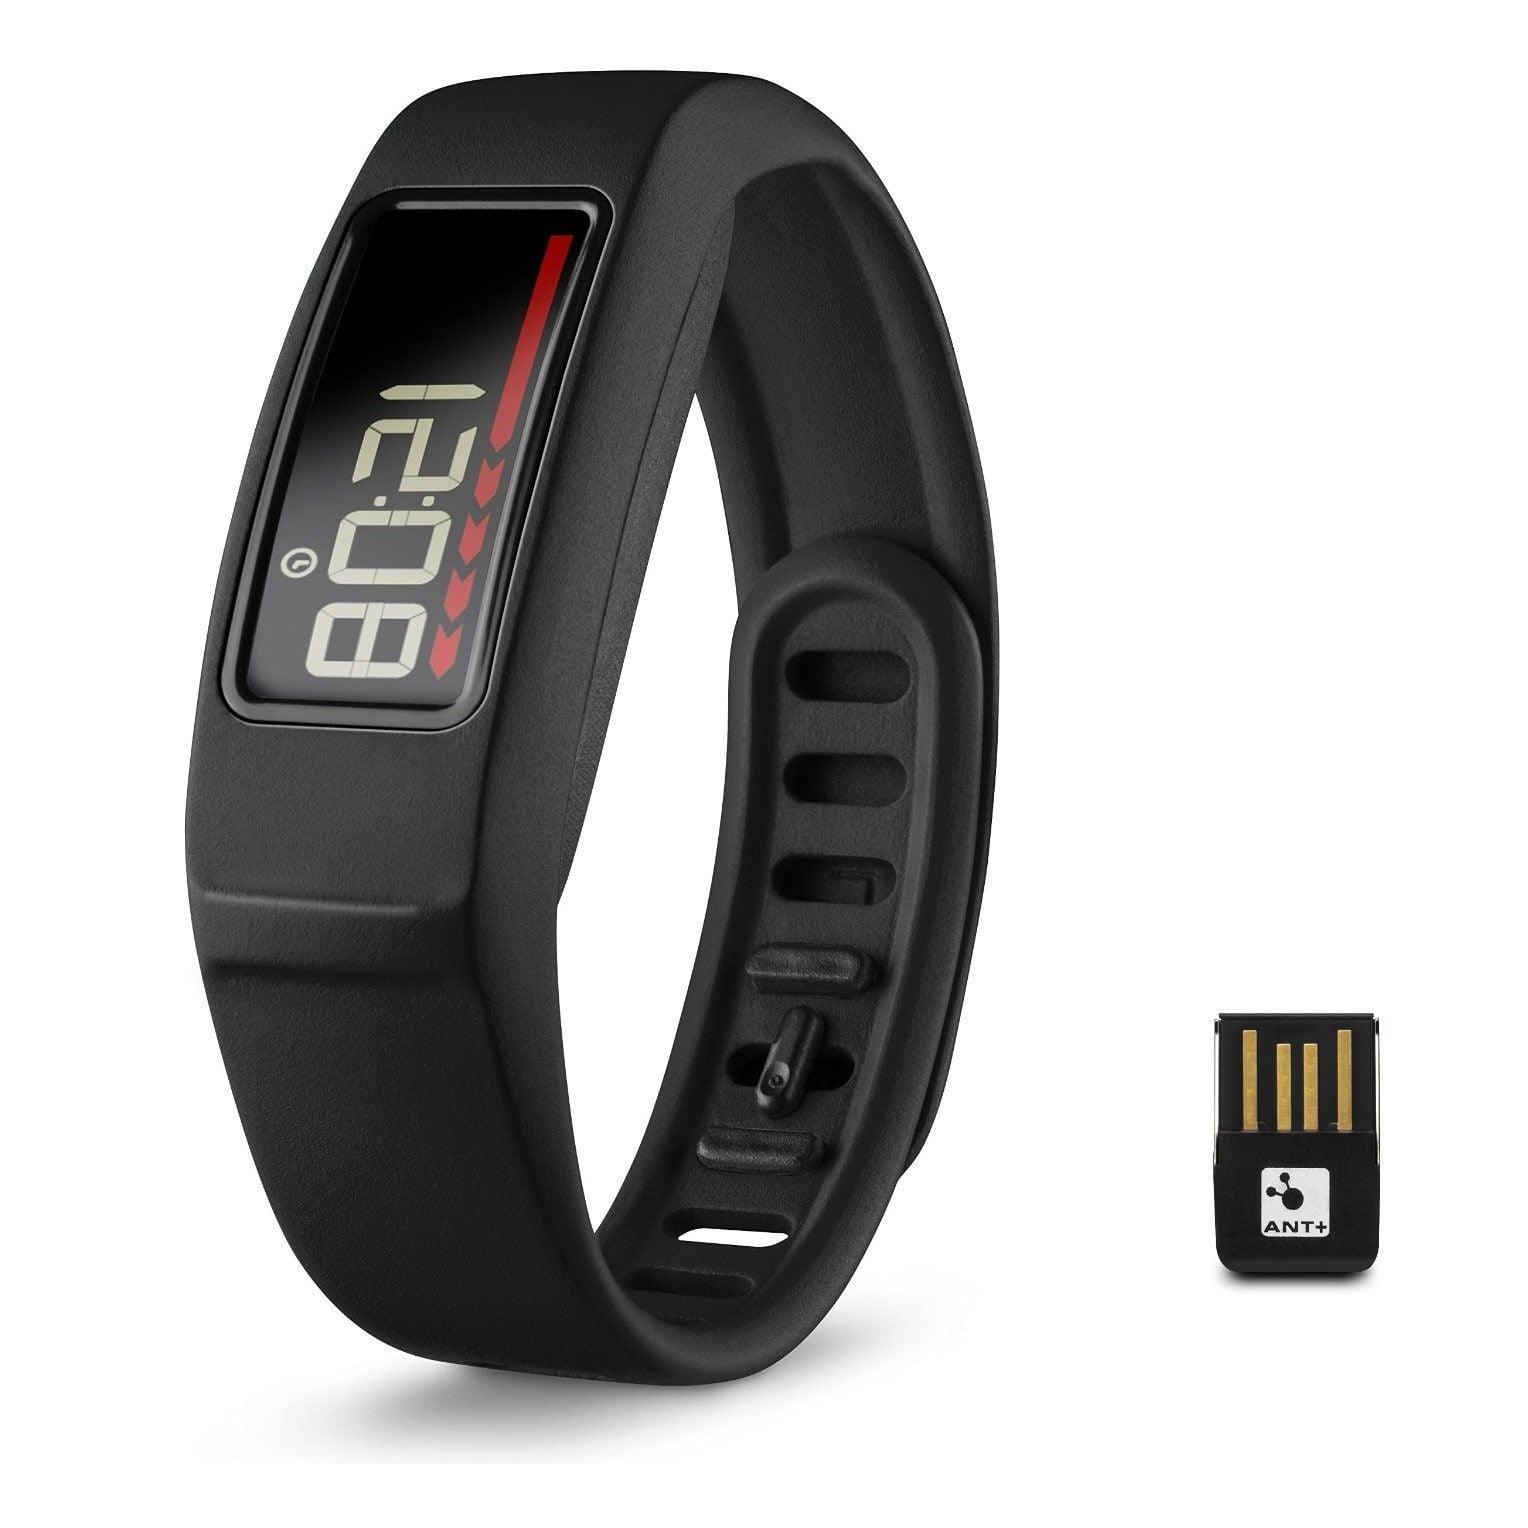 Refurbished Garmin Vivofit 2 Wireless Fitness Activity Tracker Band w/ USB ANT Stick - Black